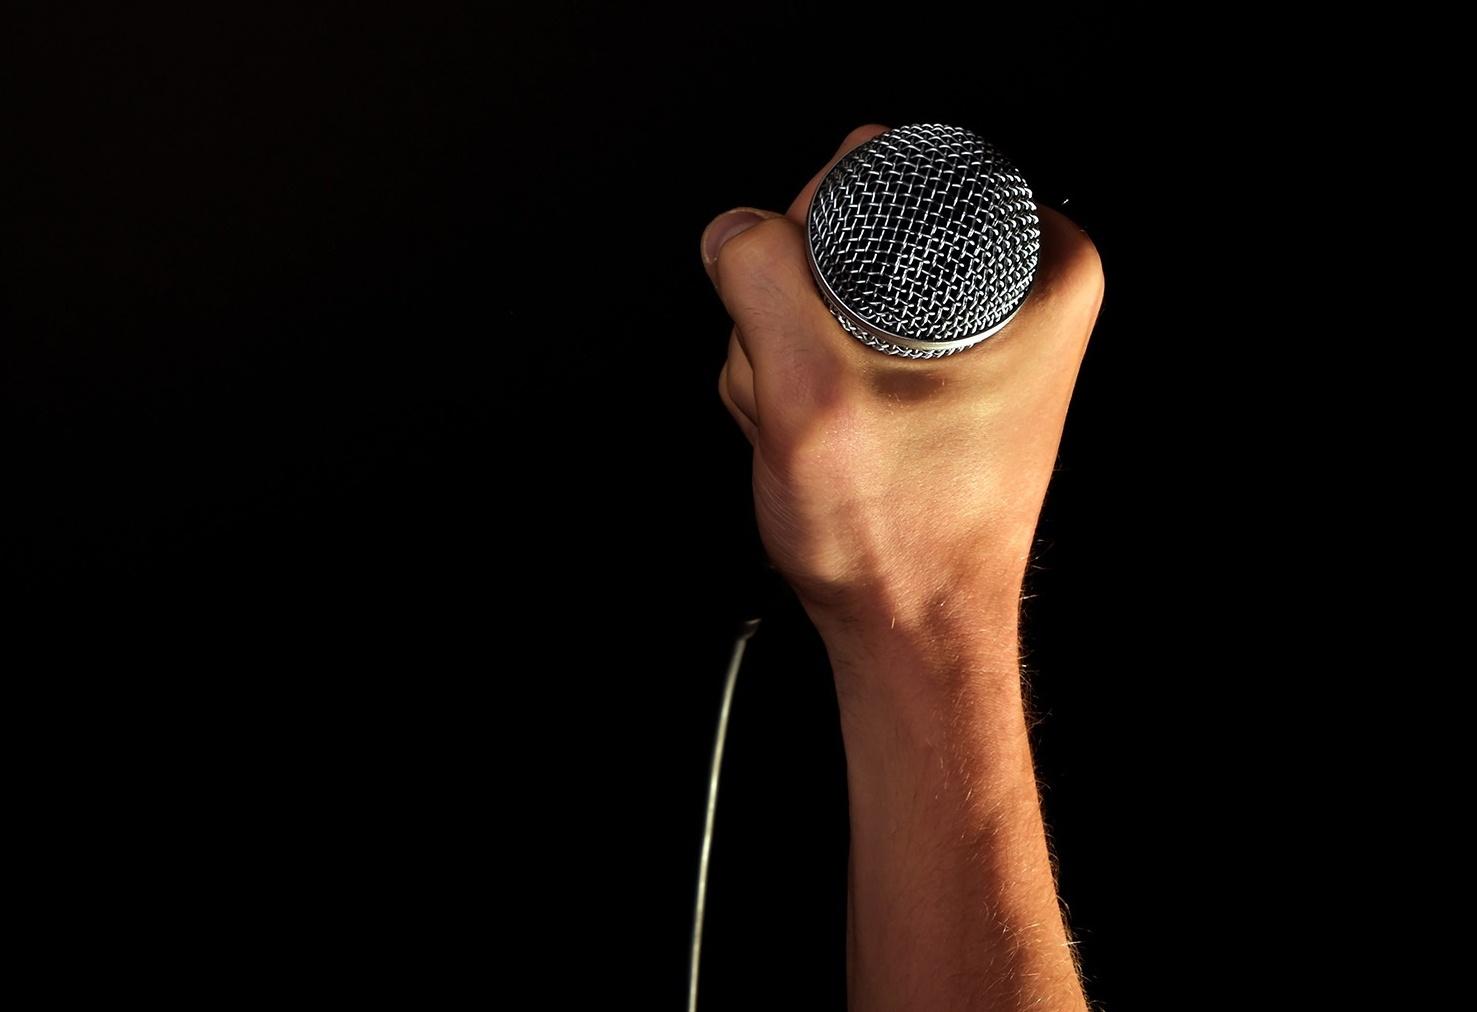 hand-microphone-mic-hold-034512-edited.jpg